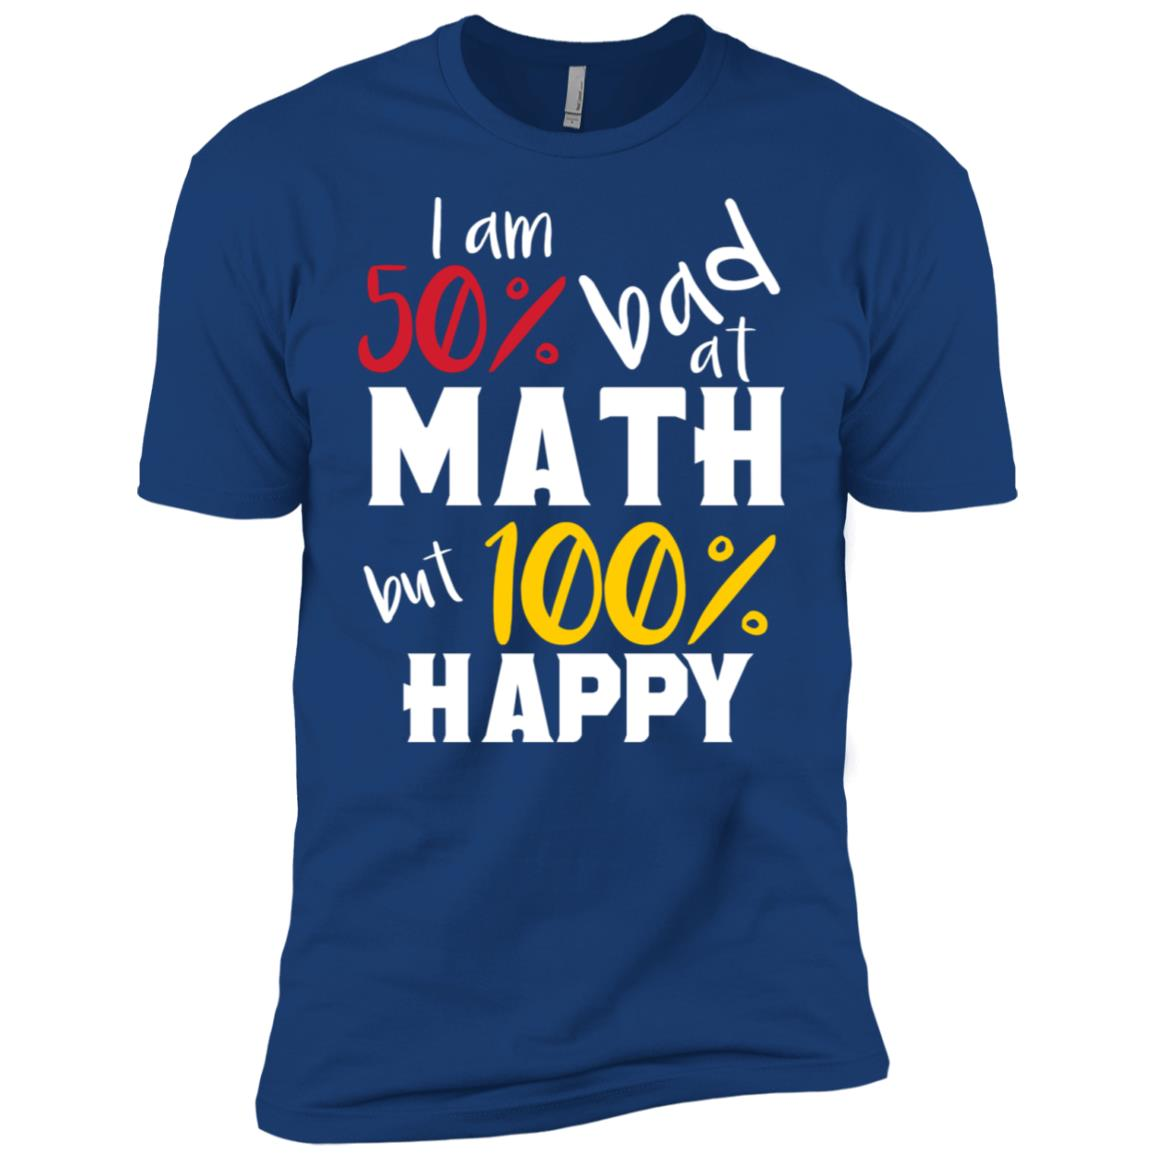 50% Bad At Math But 100% Happy – Funny Math Gift Men Short Sleeve T-Shirt